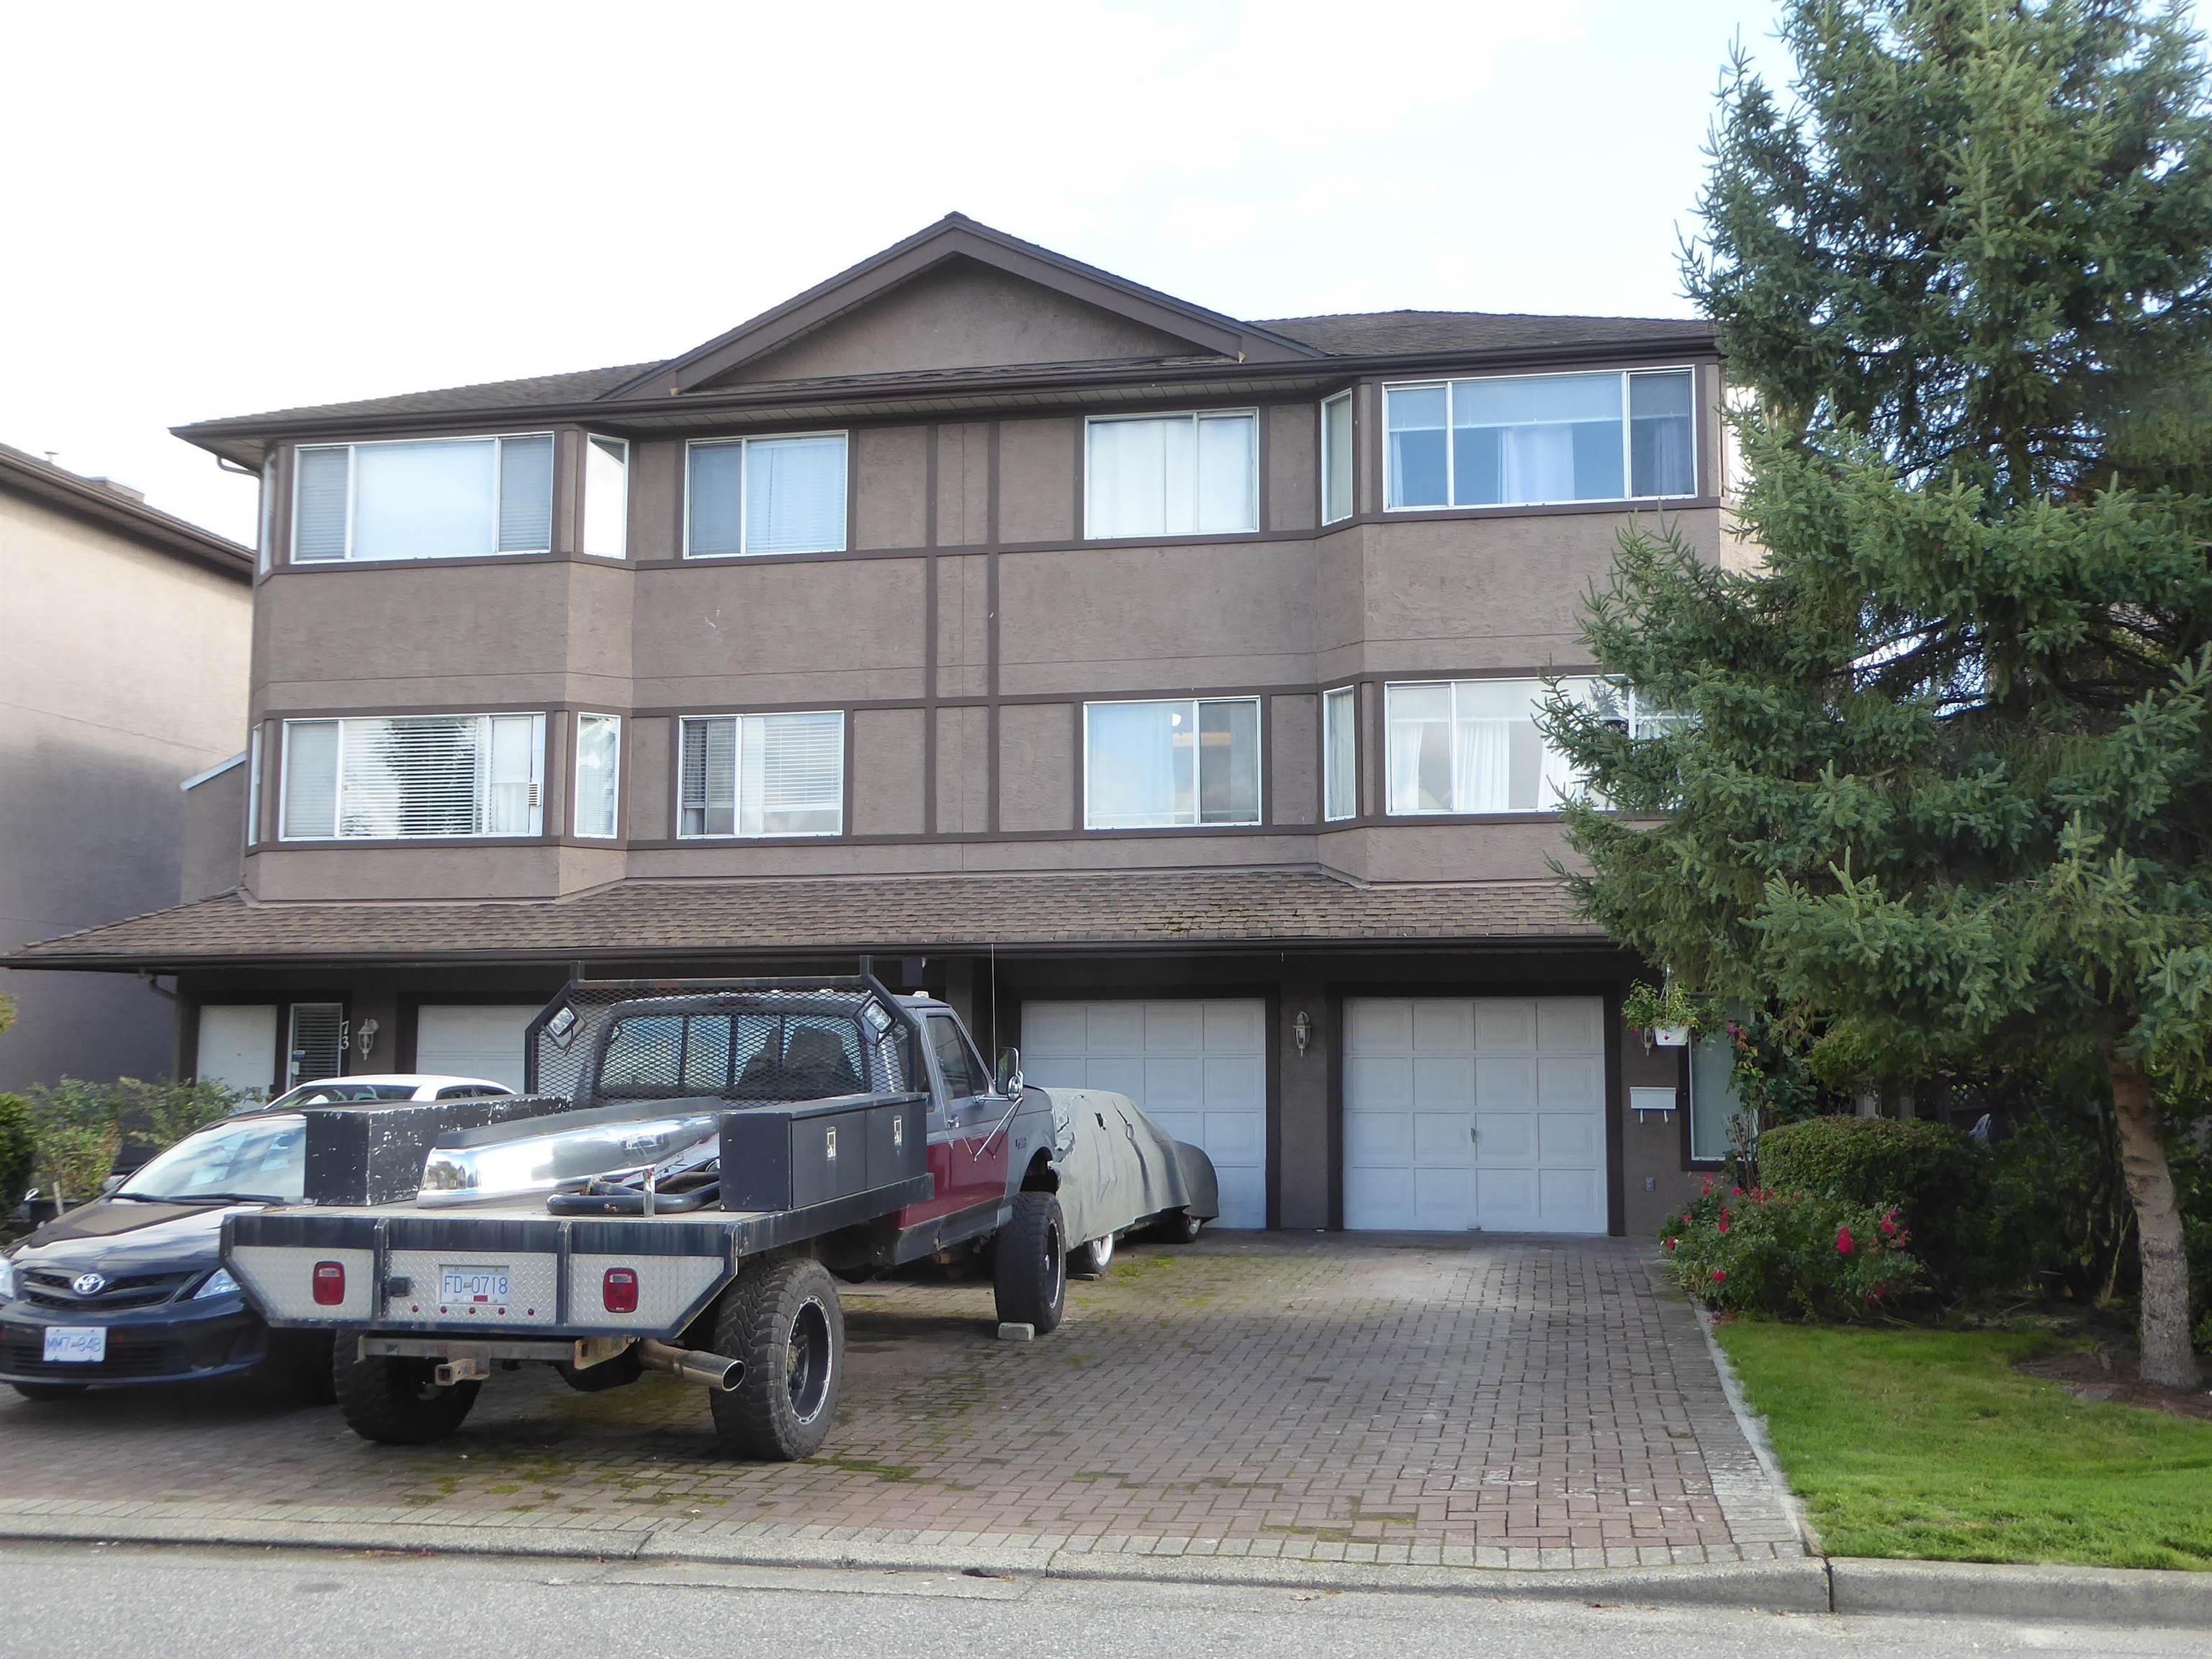 72 5380 SMITH DRIVE - Hamilton RI Townhouse for sale, 3 Bedrooms (R2623048)